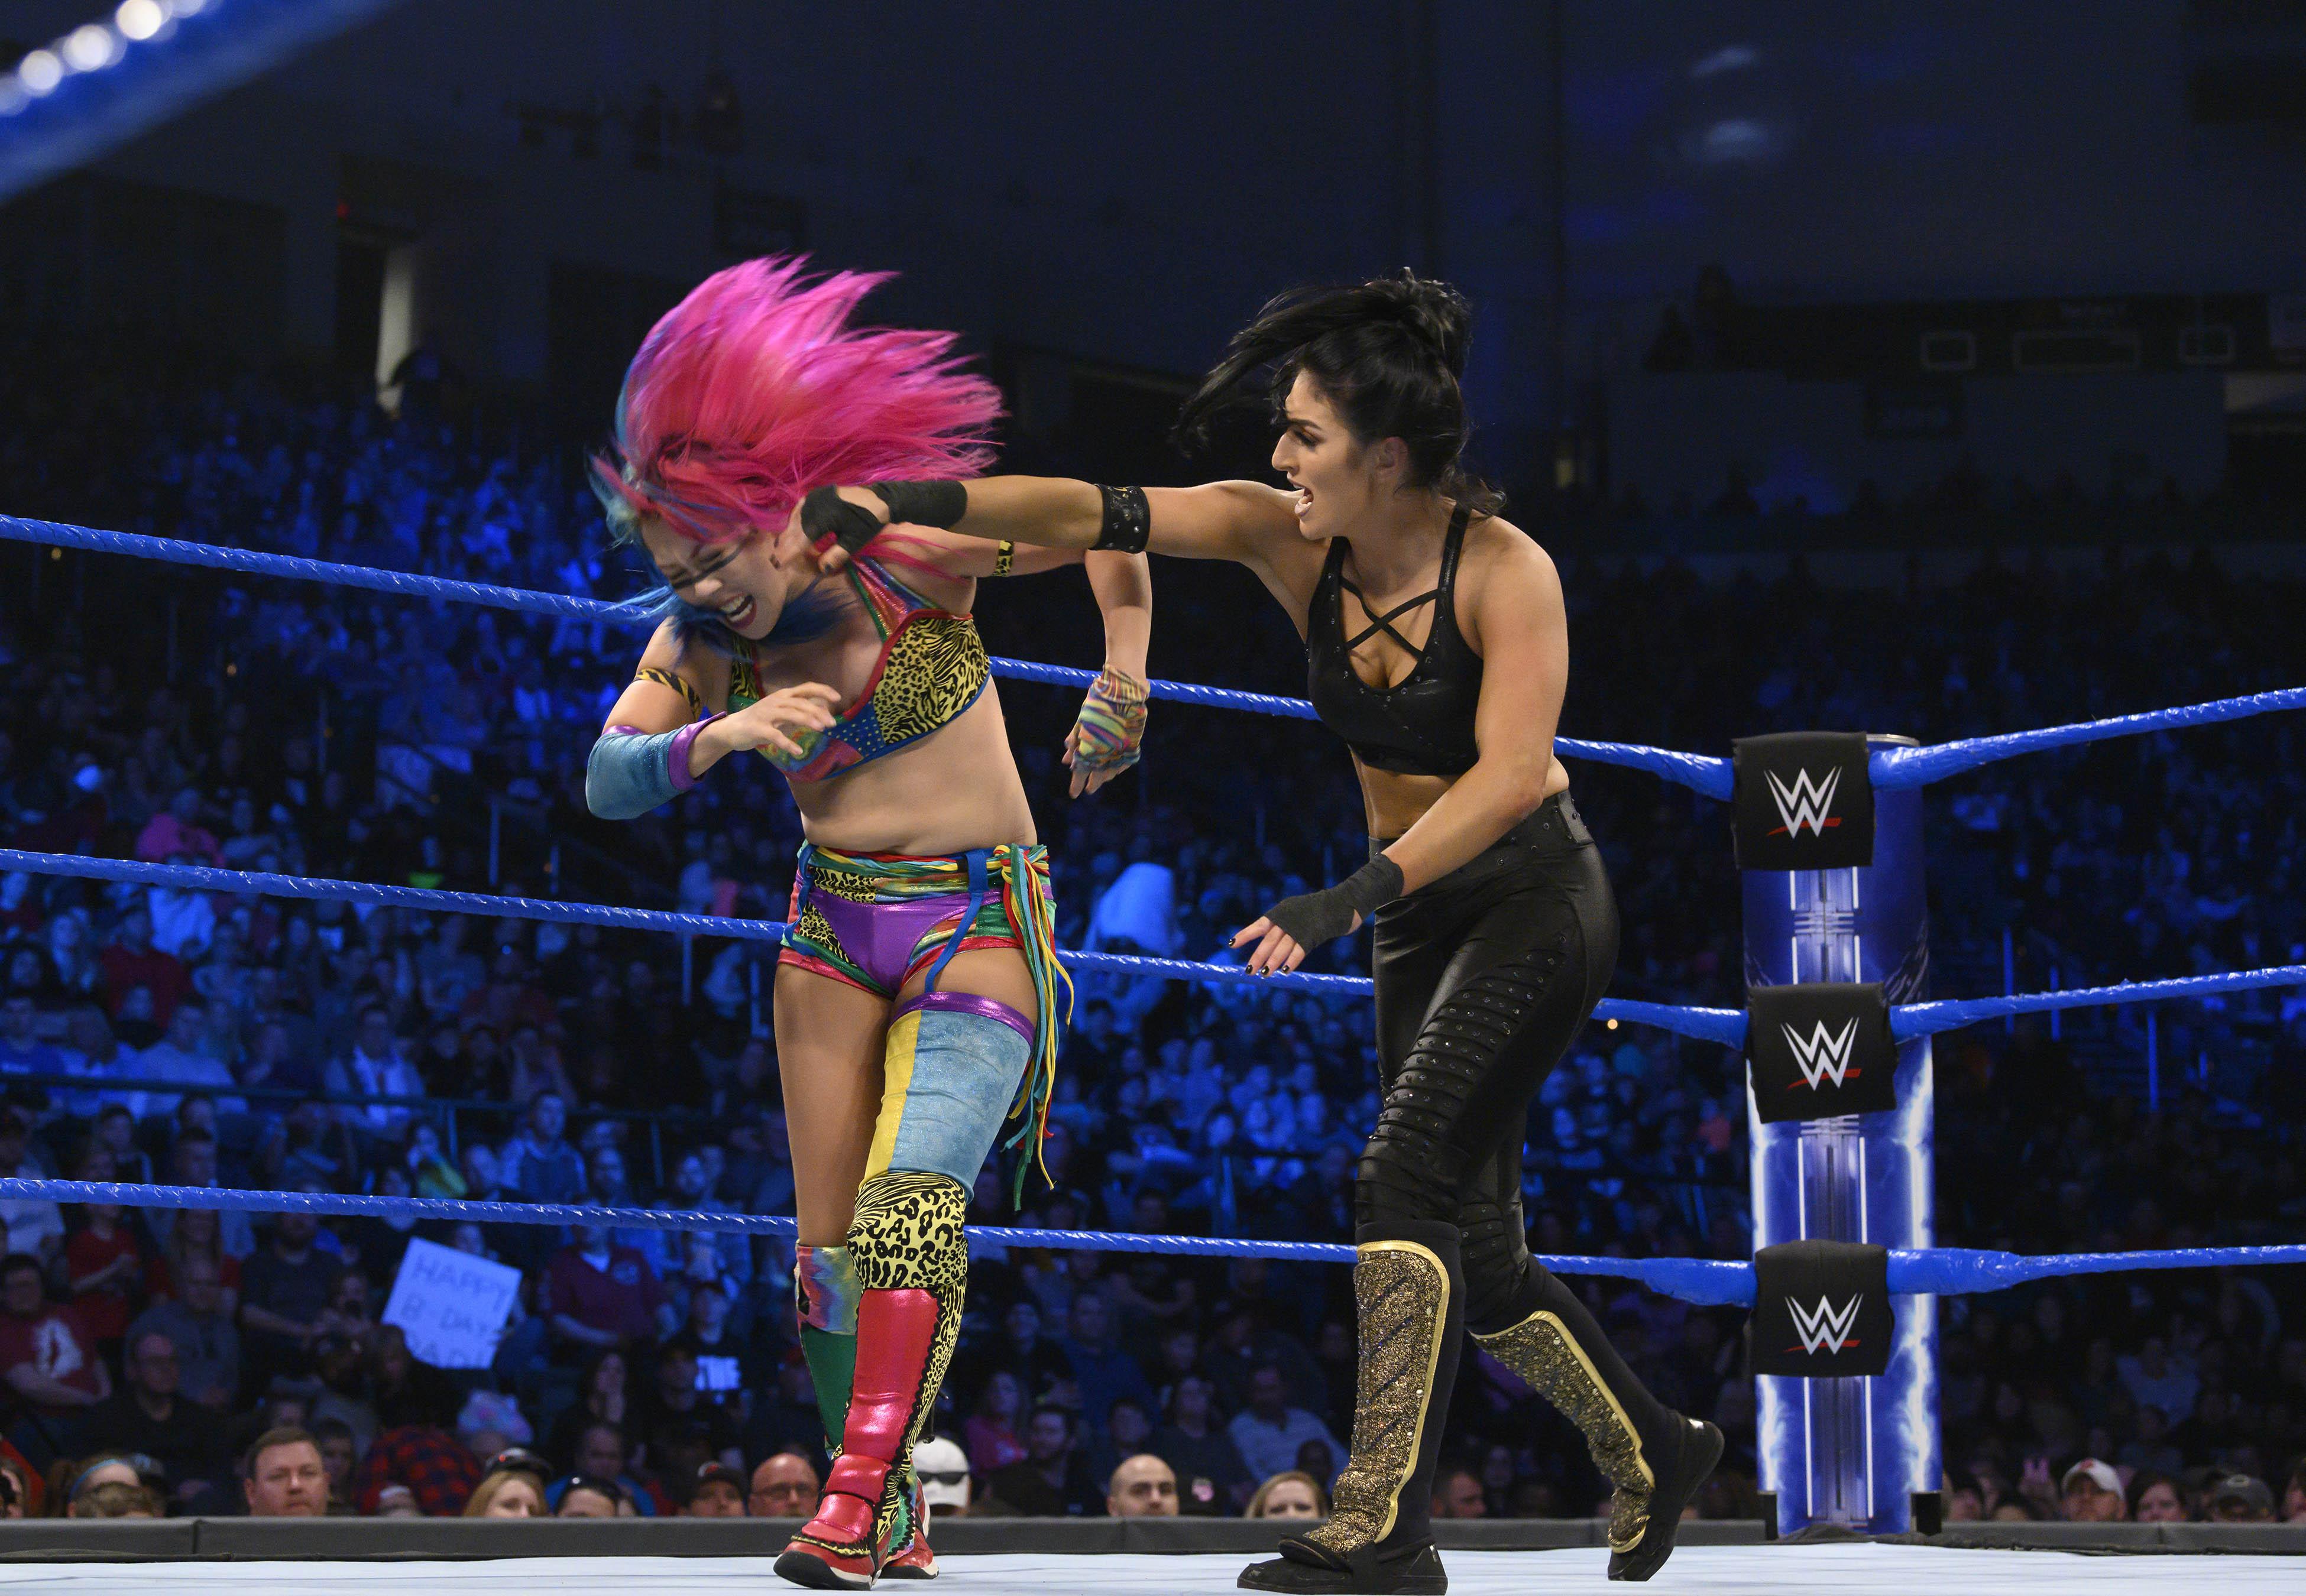 Daria Berenato (right) AKA  Sonya Deville  battles  Asuka  at a WWE SmackDown event in March 2019